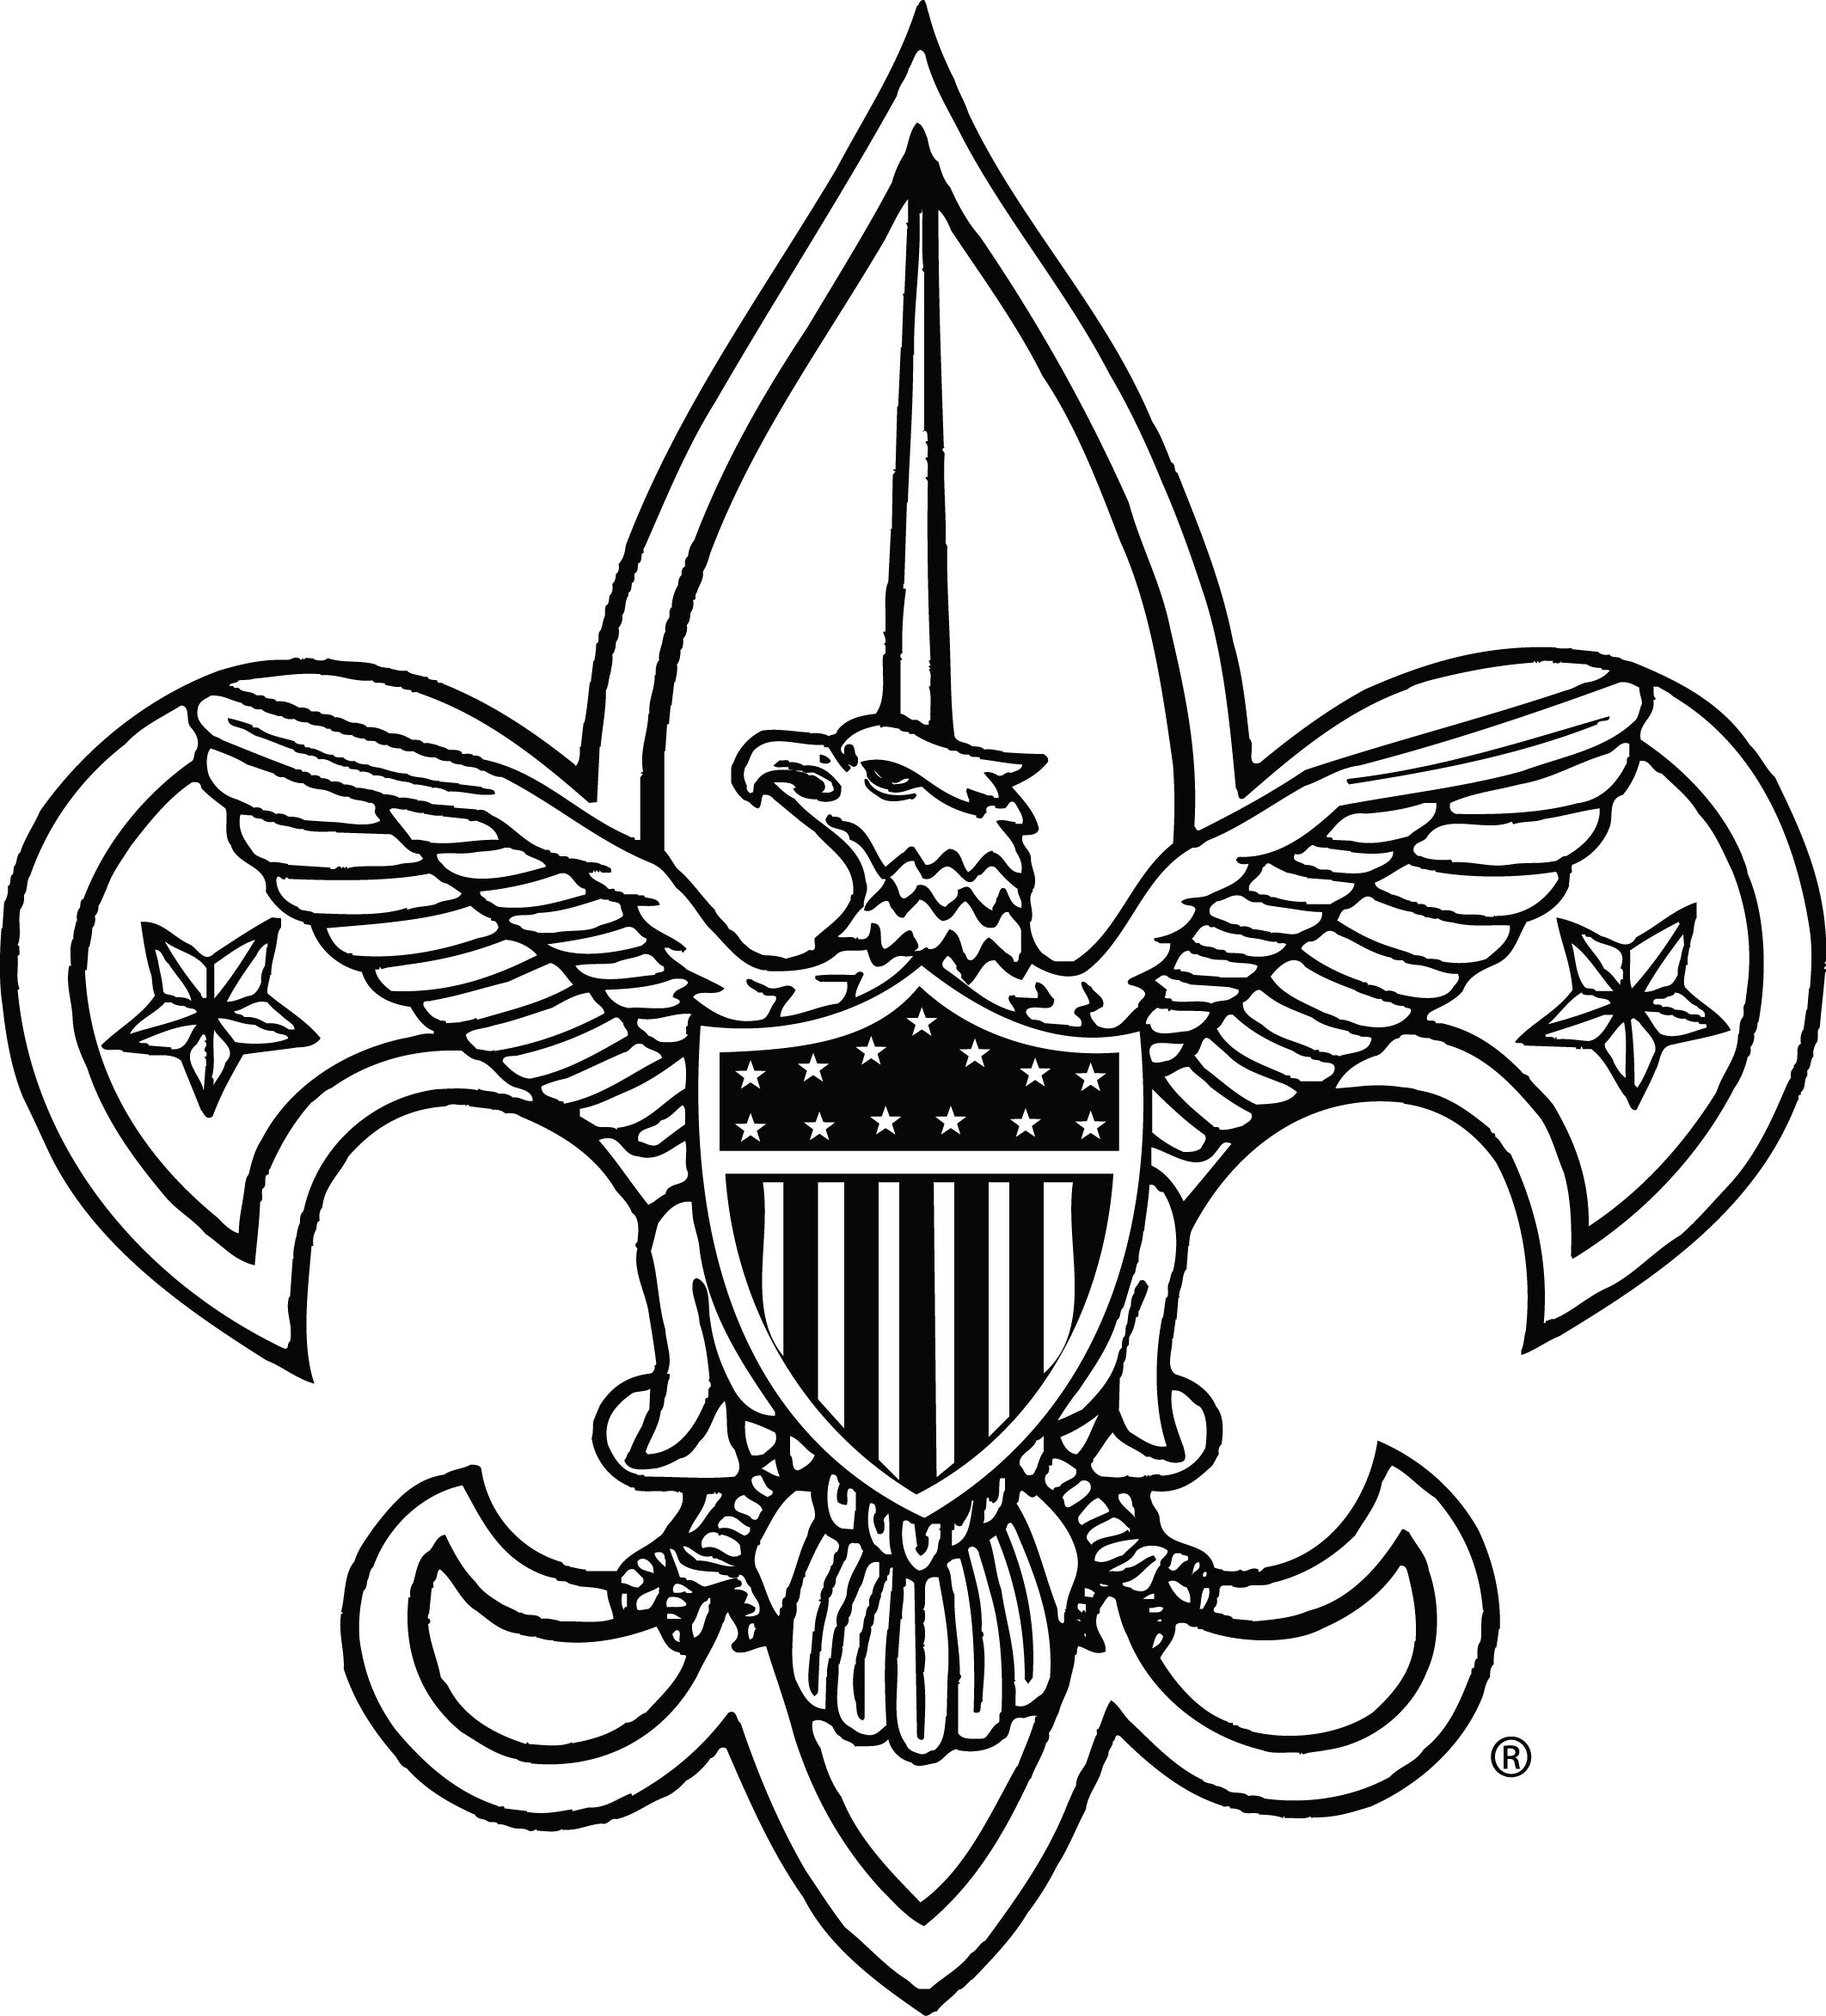 ... Clip Art Boy Scout Emblem Clipart ..-... Clip Art Boy Scout Emblem Clipart ...-17